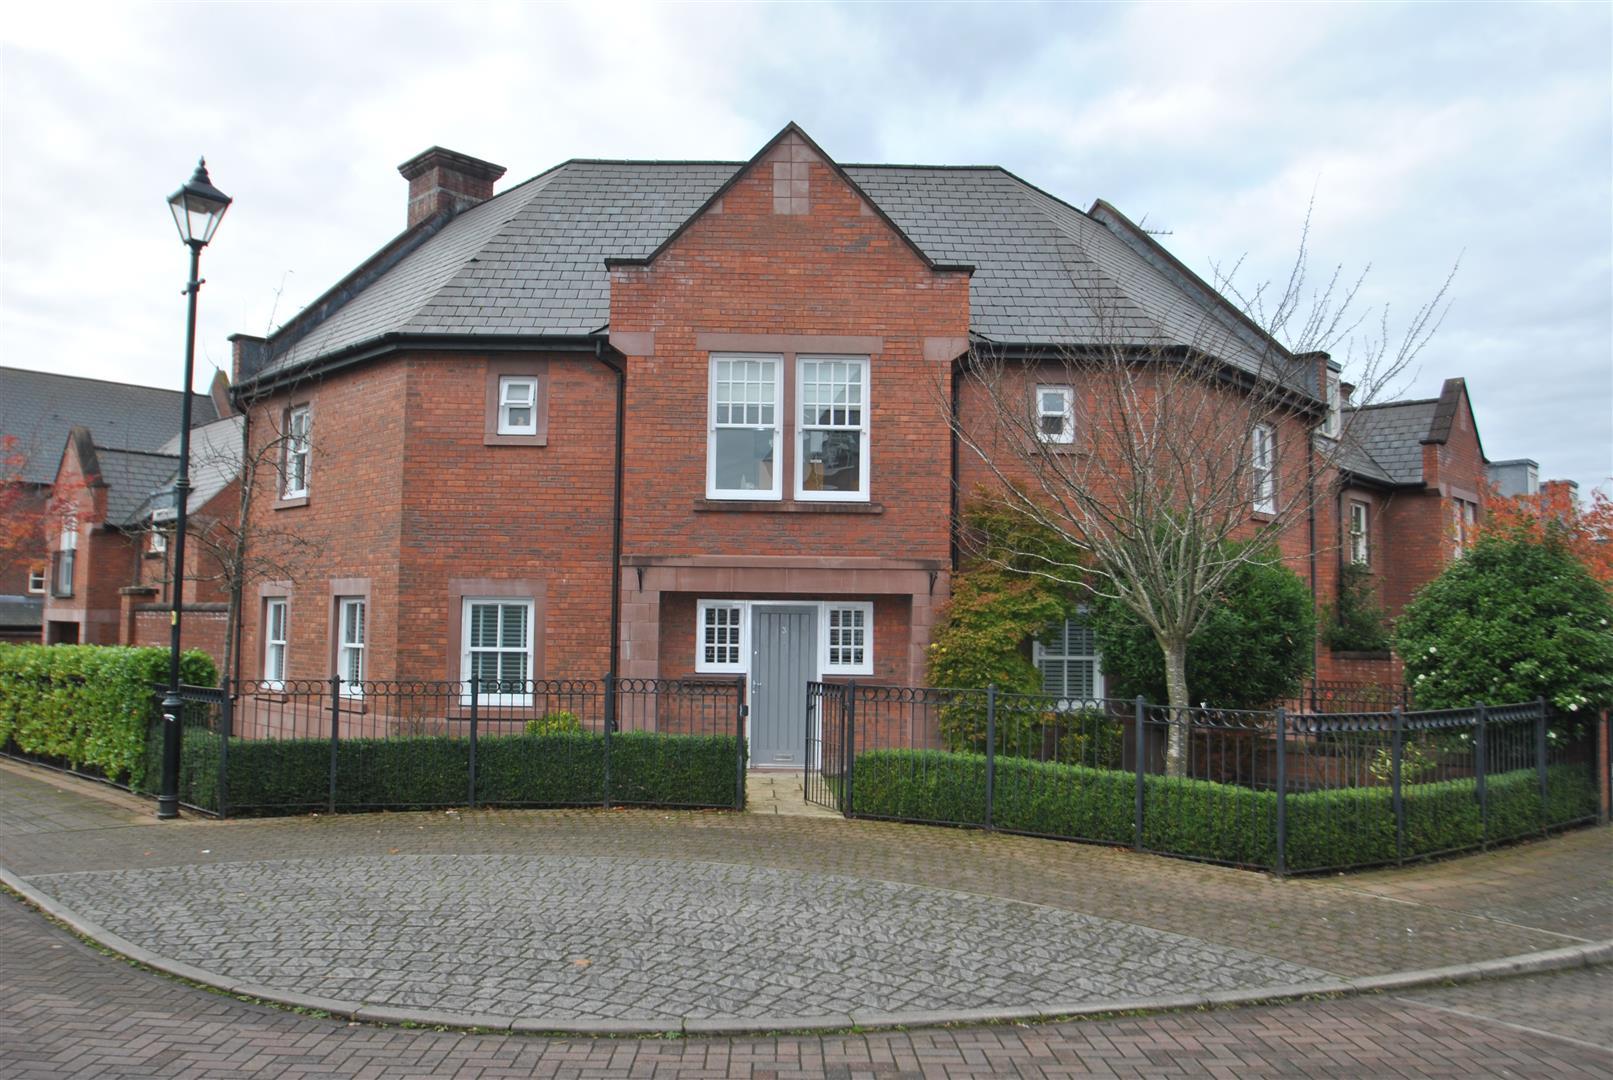 4 Bedrooms Detached House for sale in Bretland Drive, GRAPPENHALL HEYS, Warrington, WA4